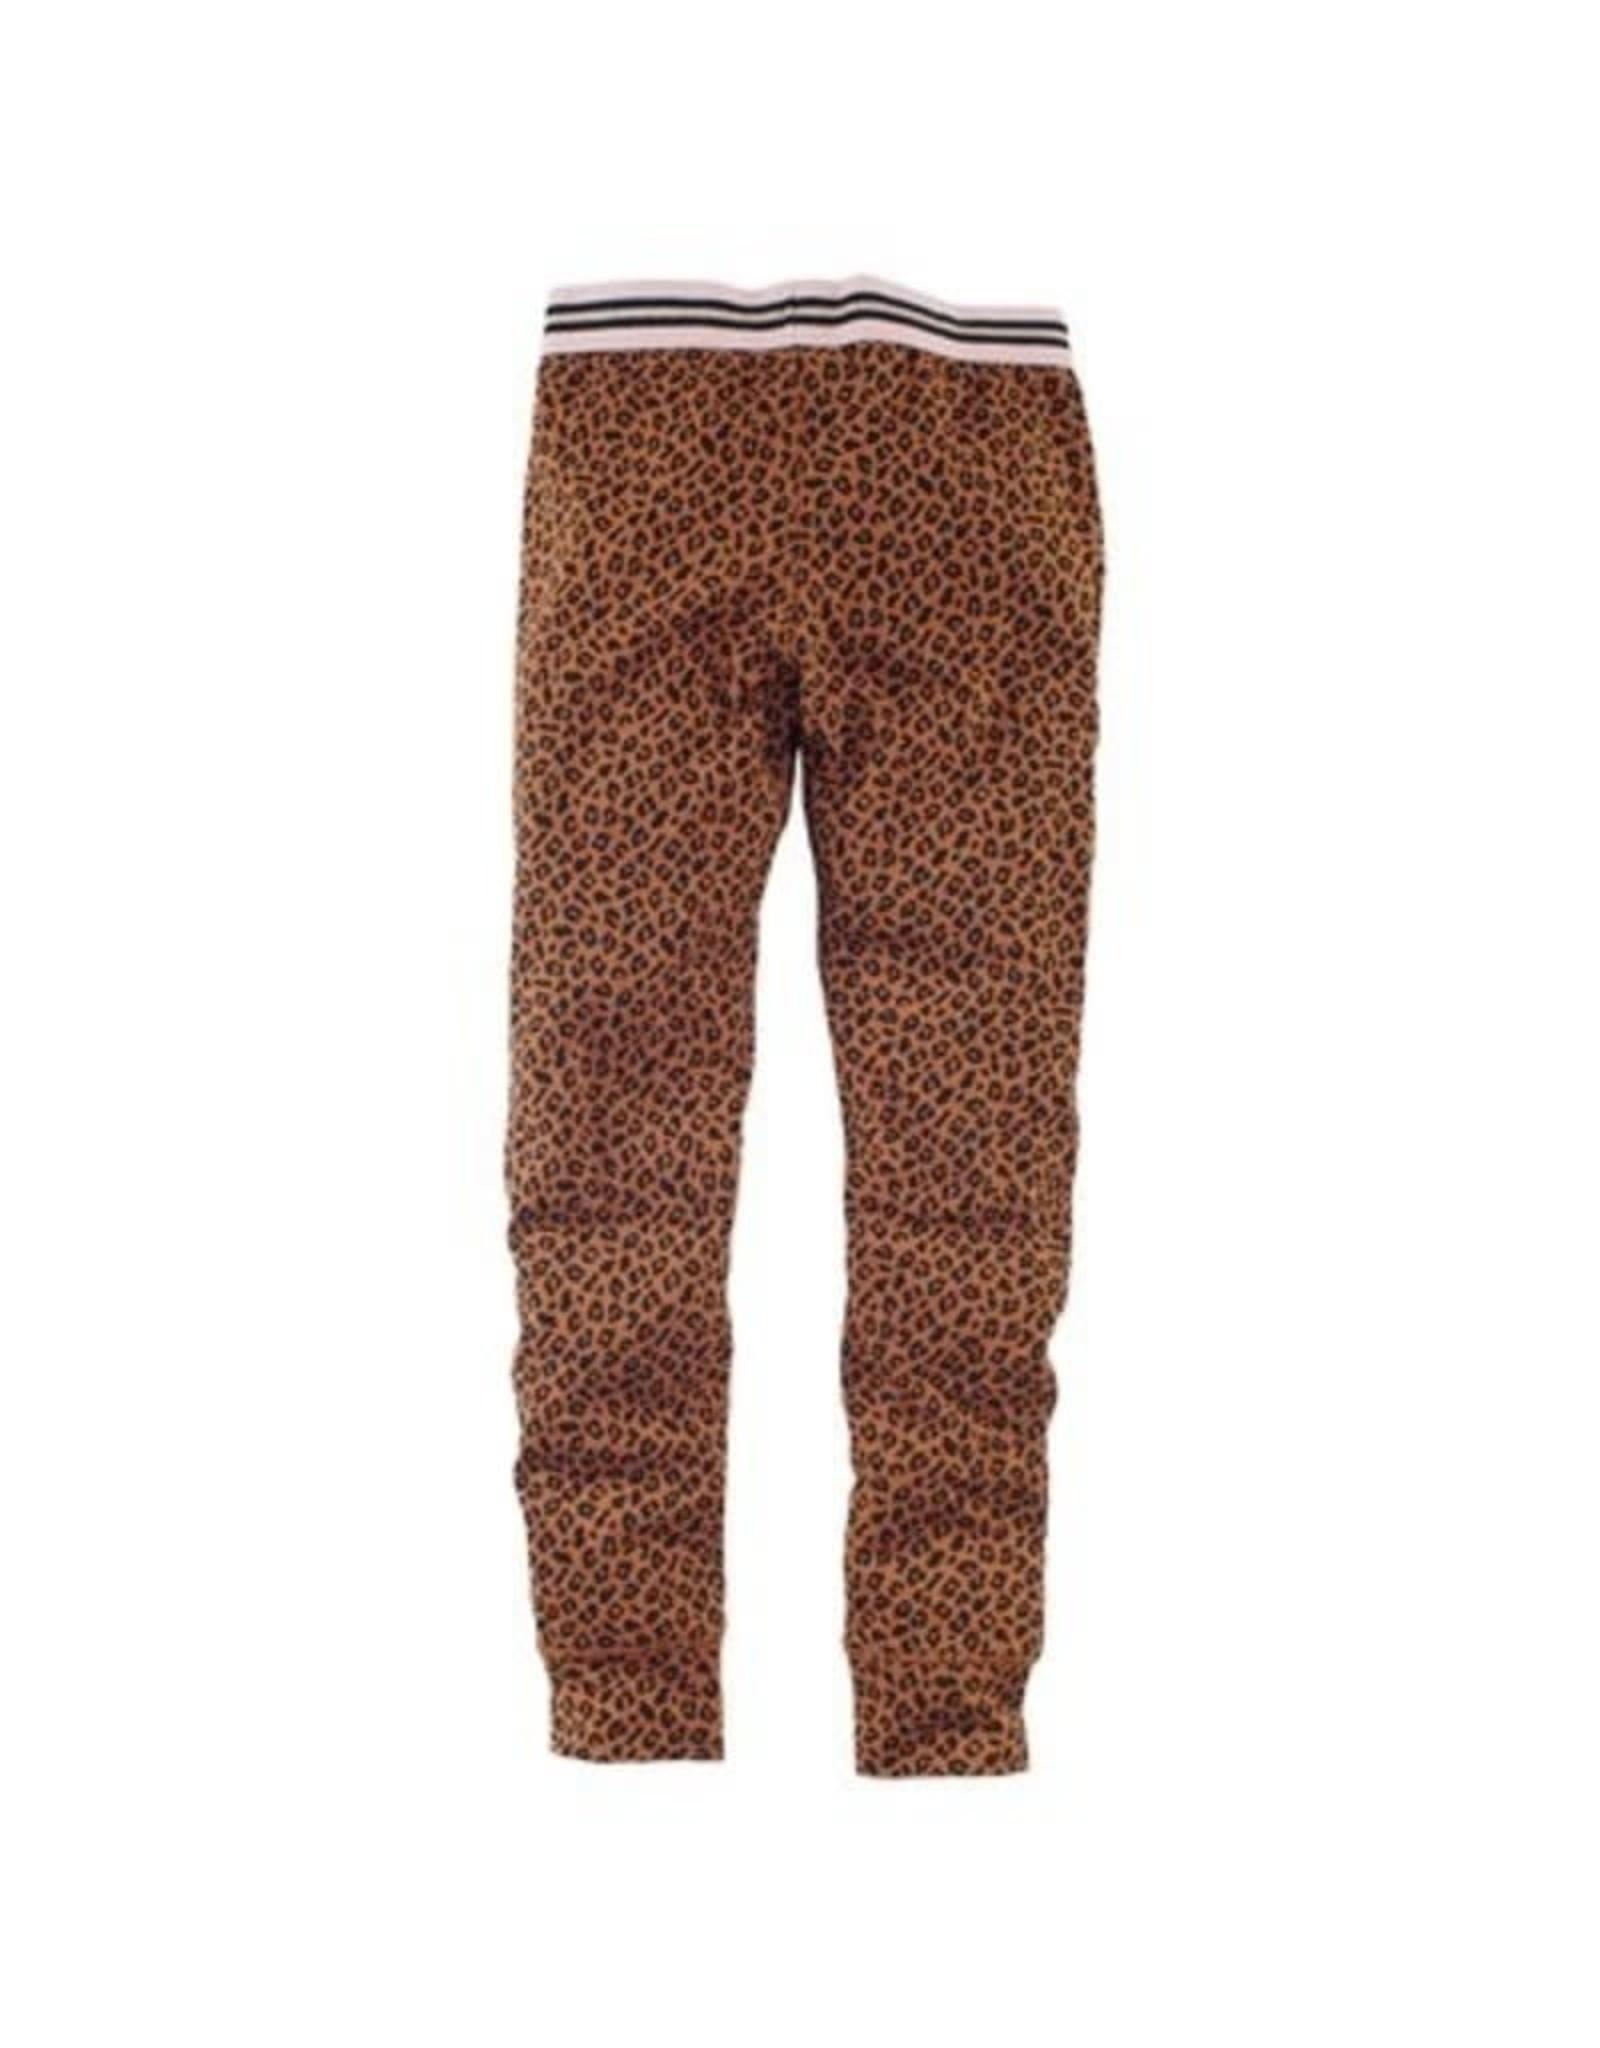 Z8 Anastacia Cognac/Leopard